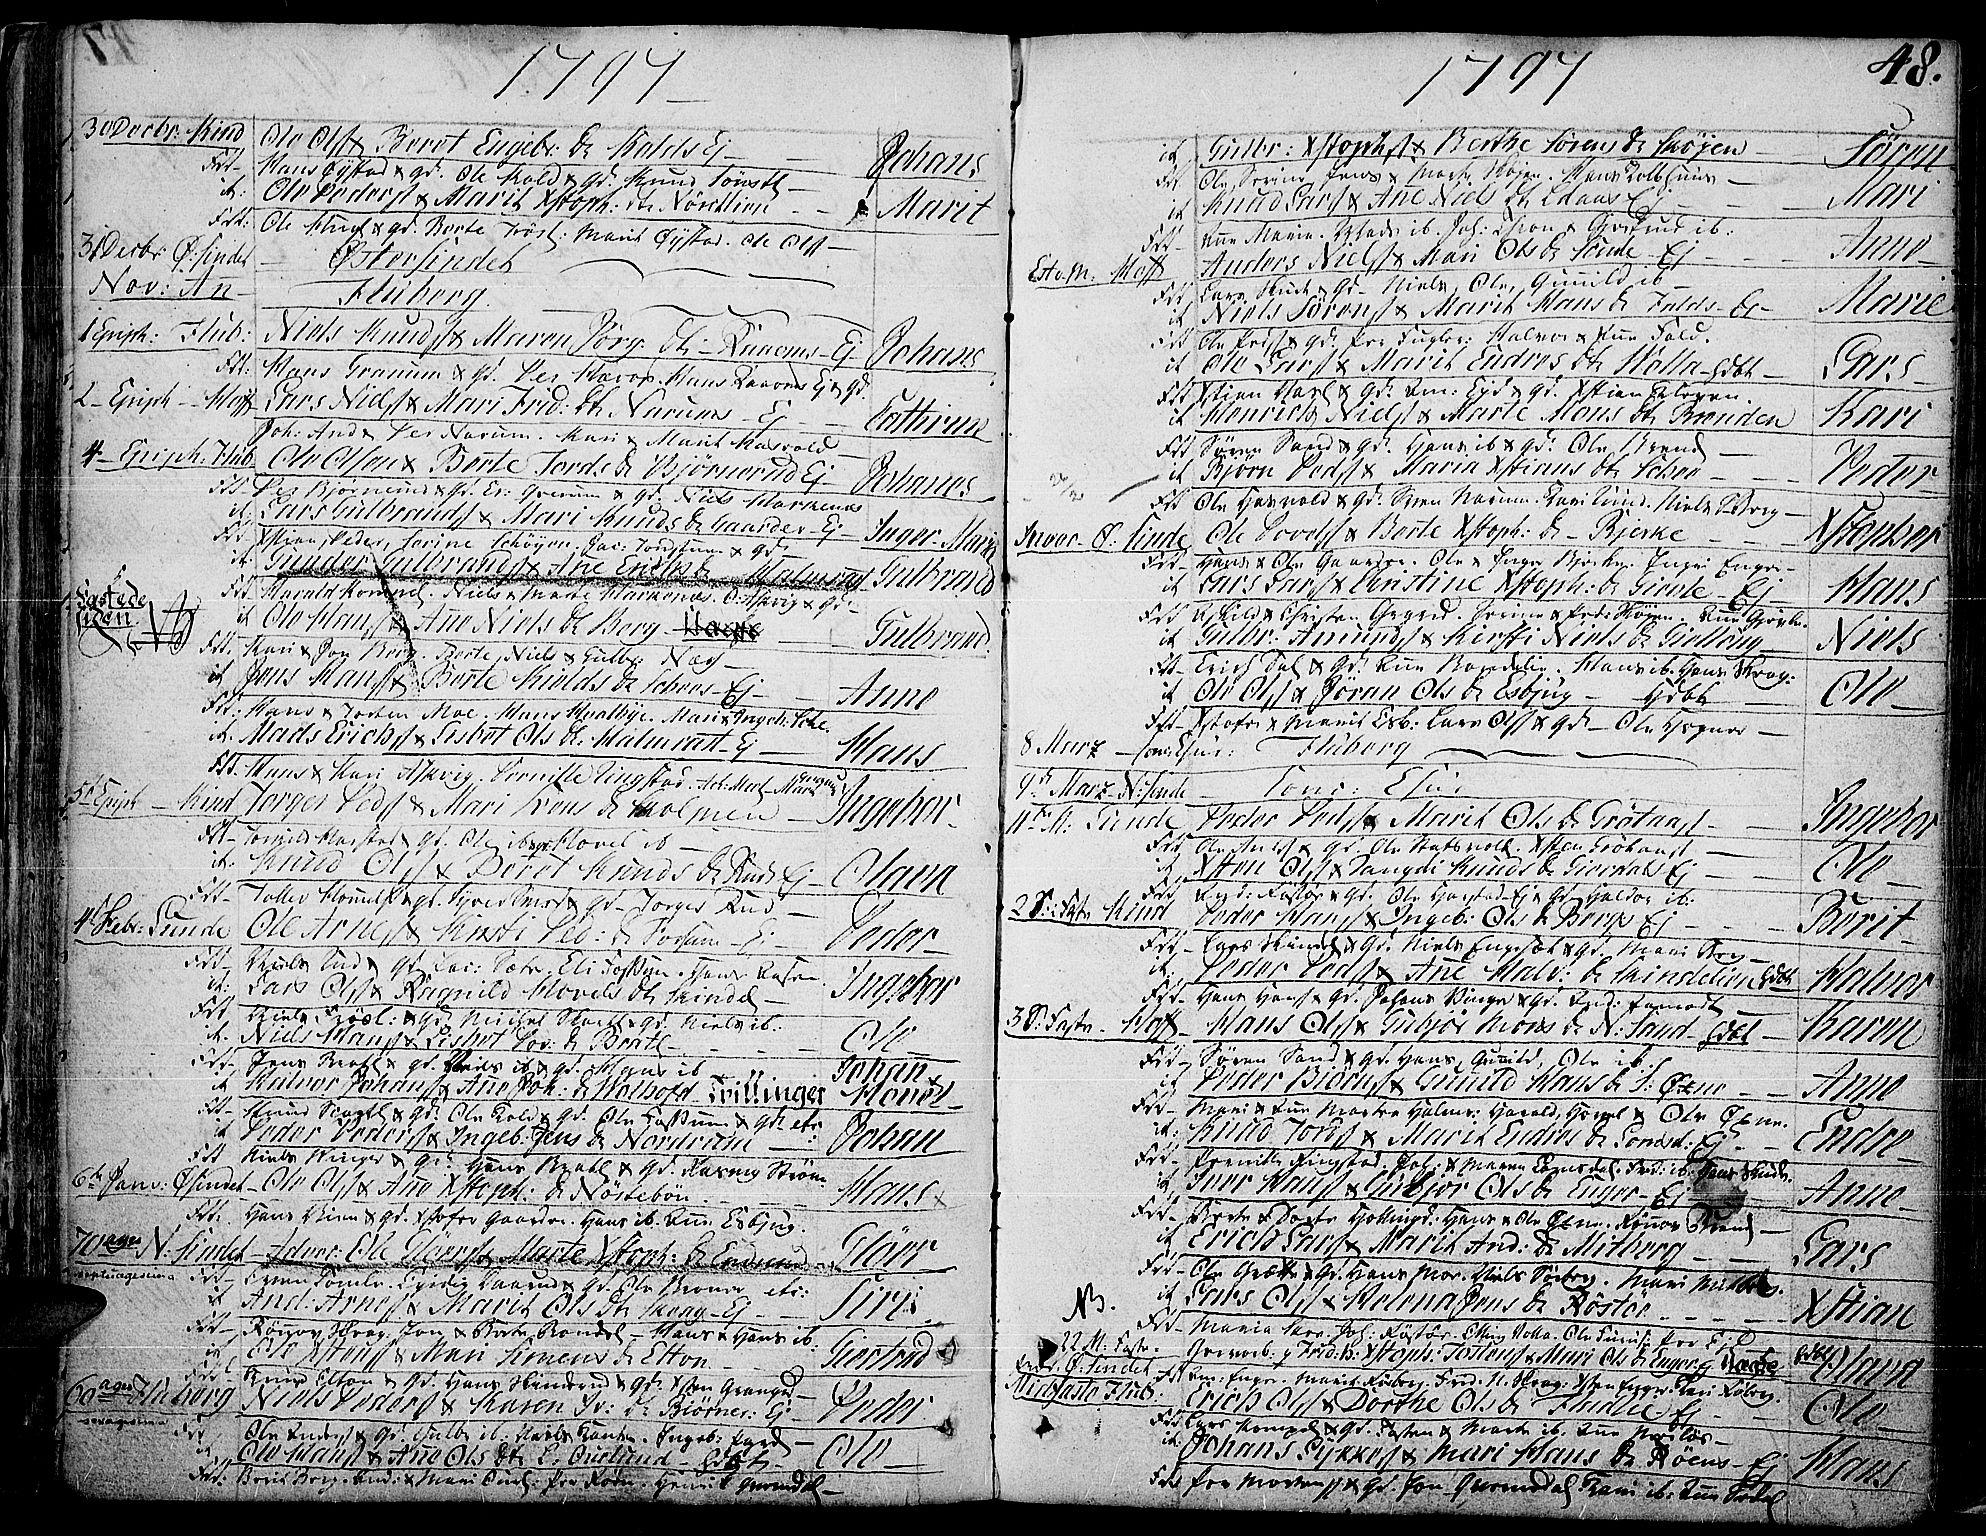 SAH, Land prestekontor, Ministerialbok nr. 6, 1784-1813, s. 48